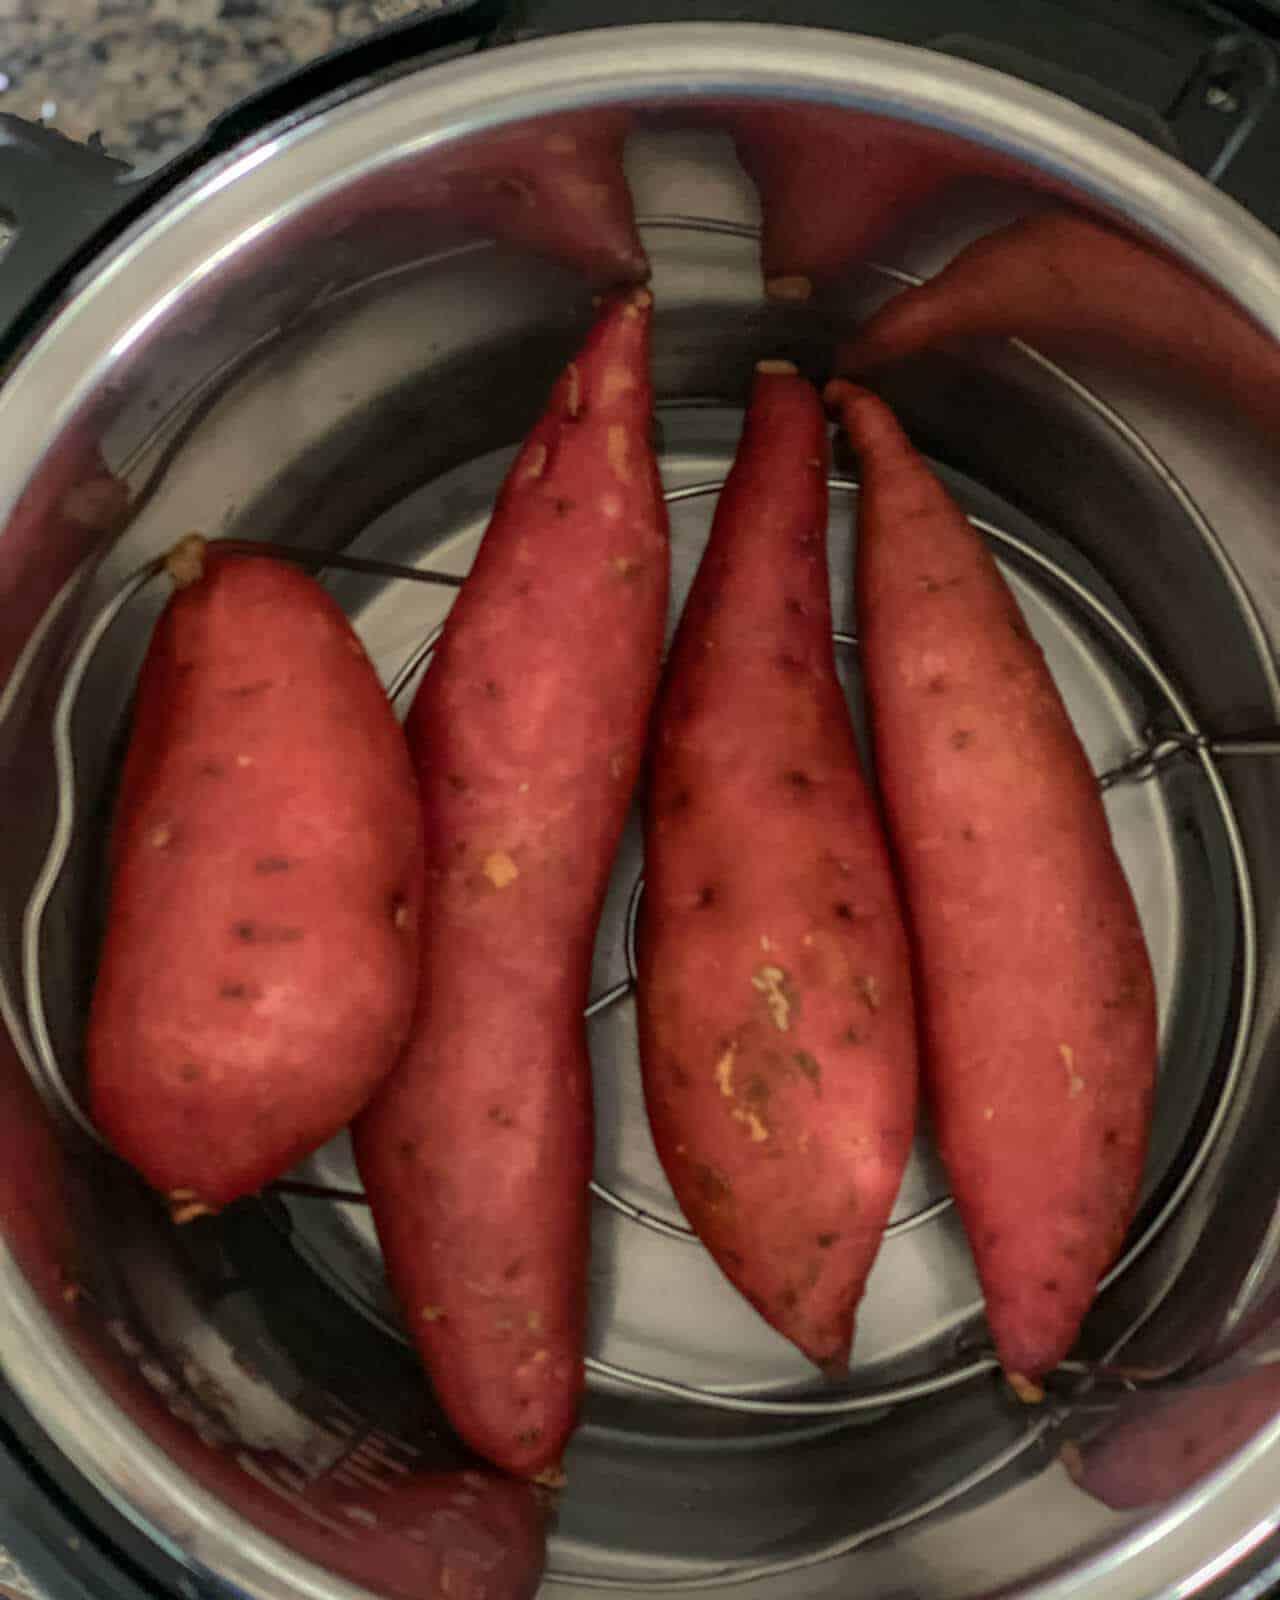 Four sweet potatoes on a trivet inside an instant pot pressure cooker.